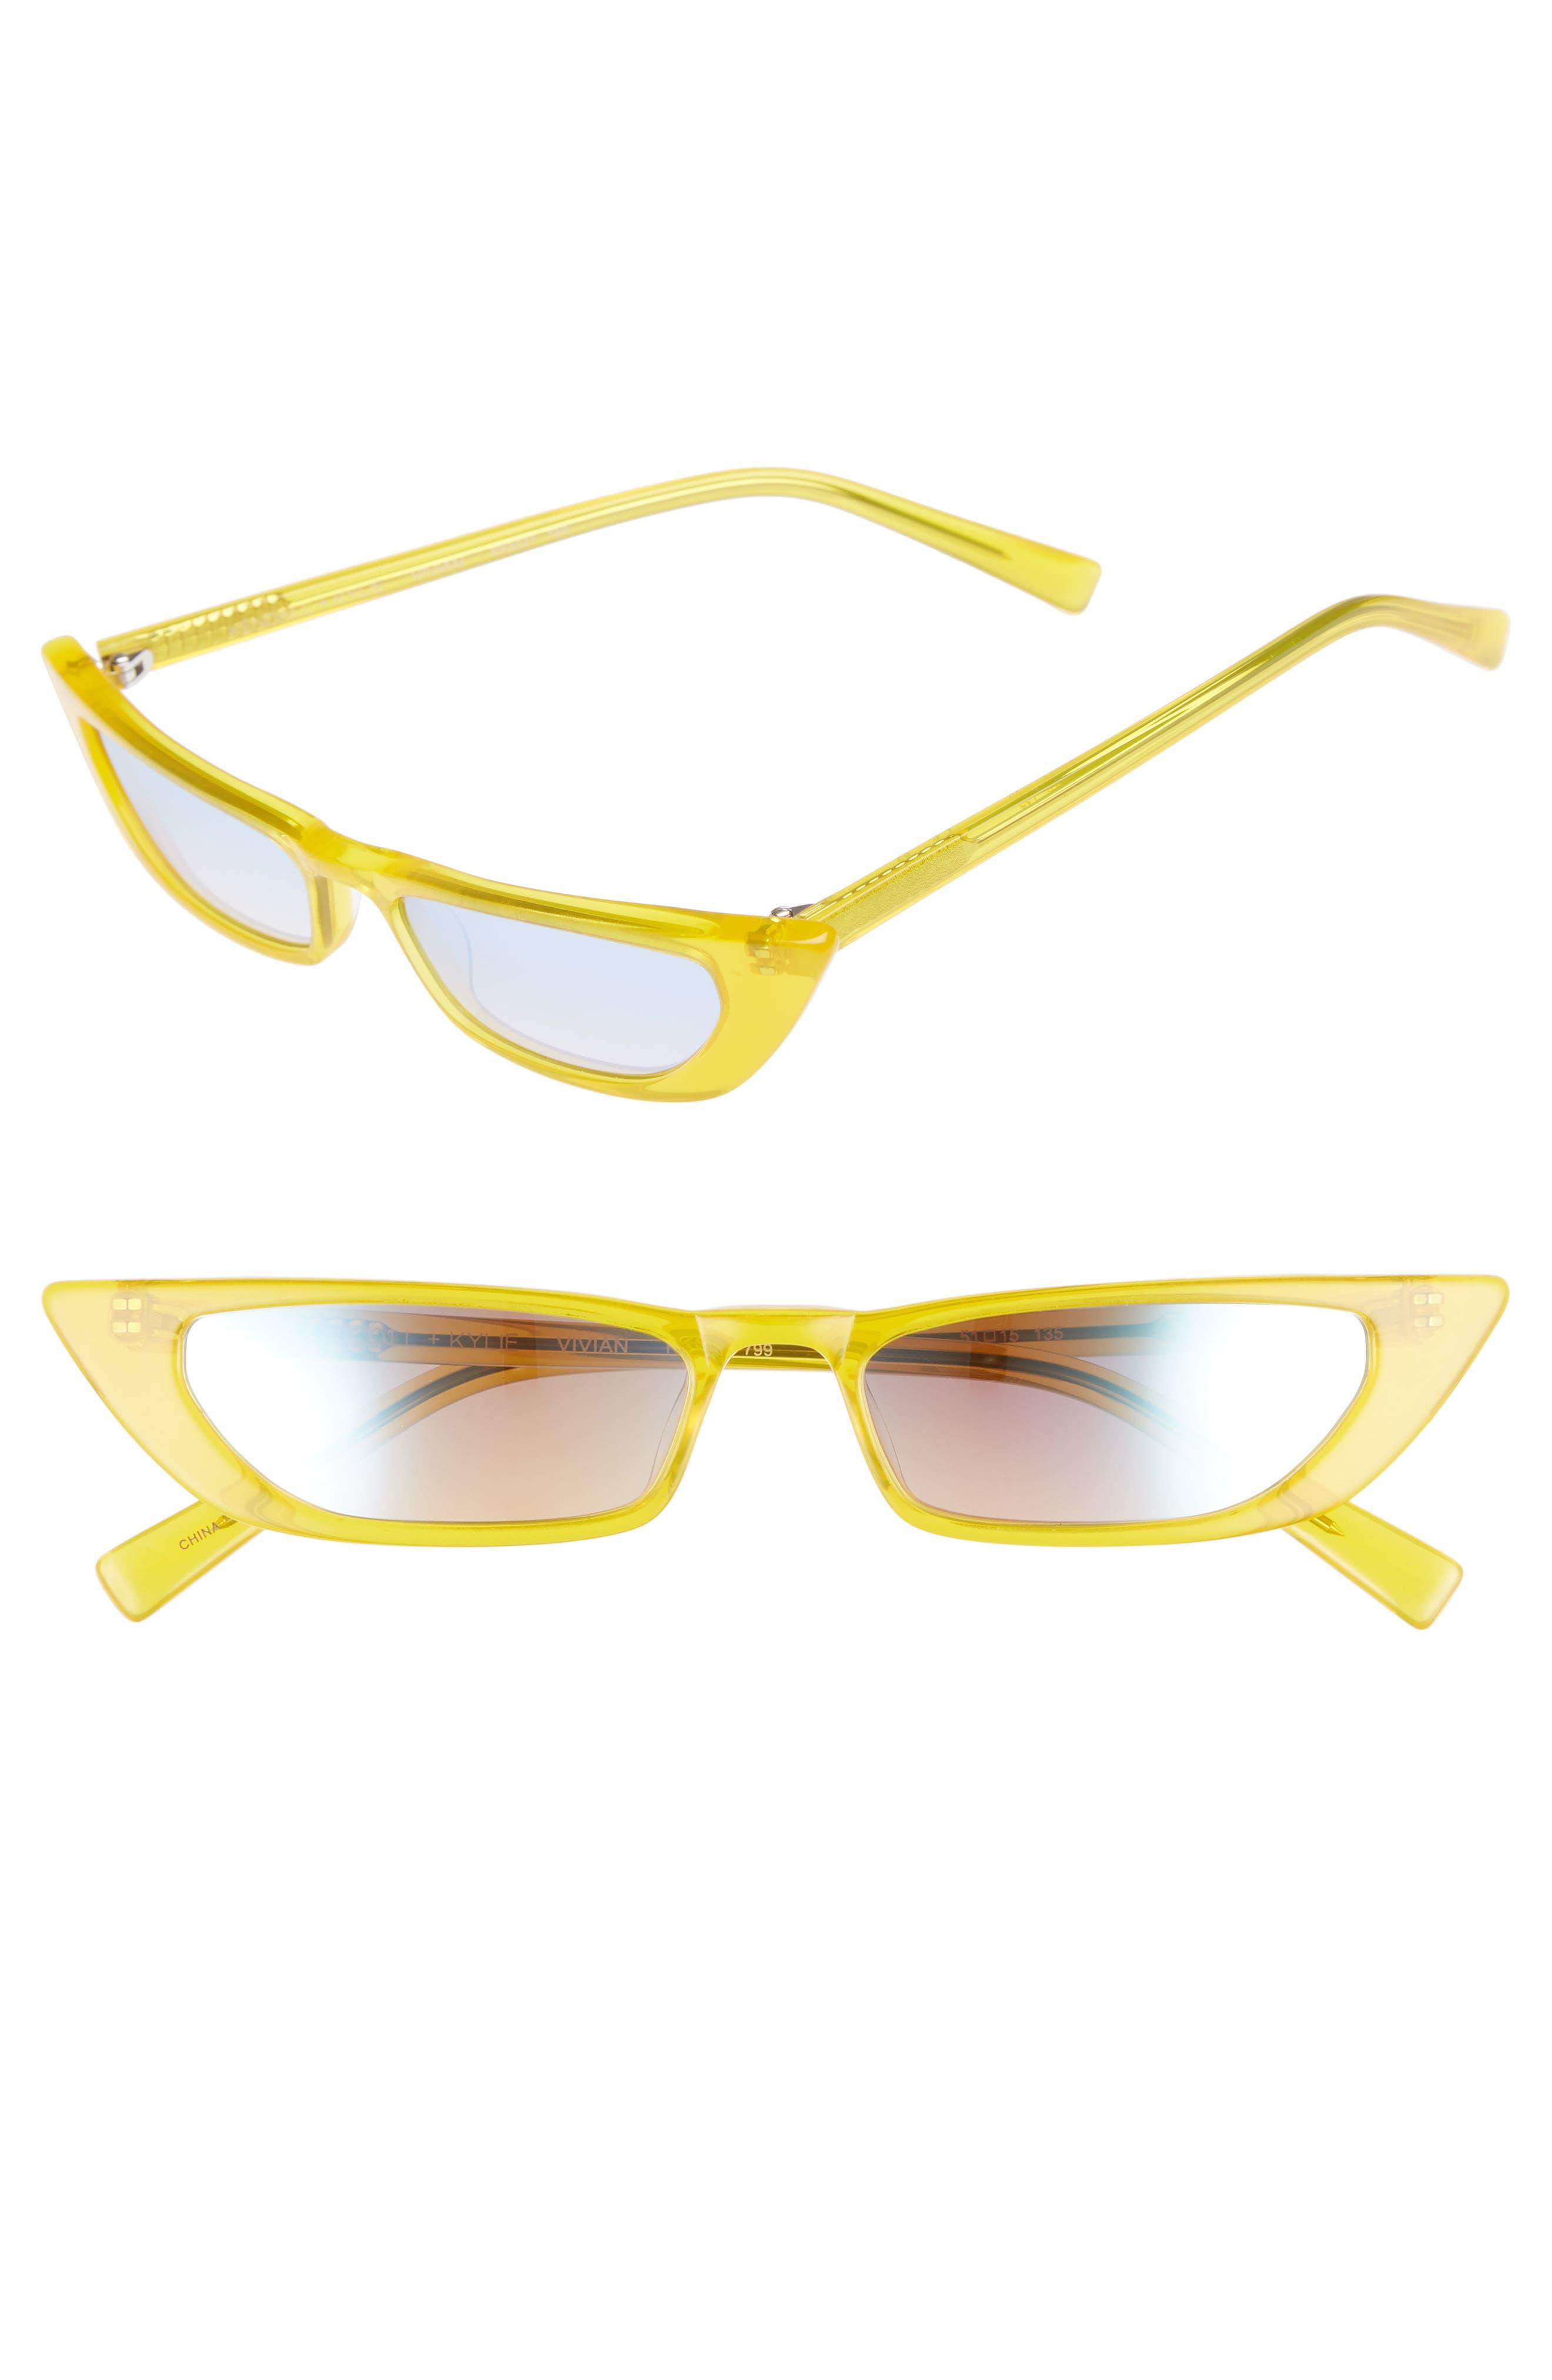 KENDALL + KYLIE Vivian Extreme 51mm Cat Eye Sunglasses